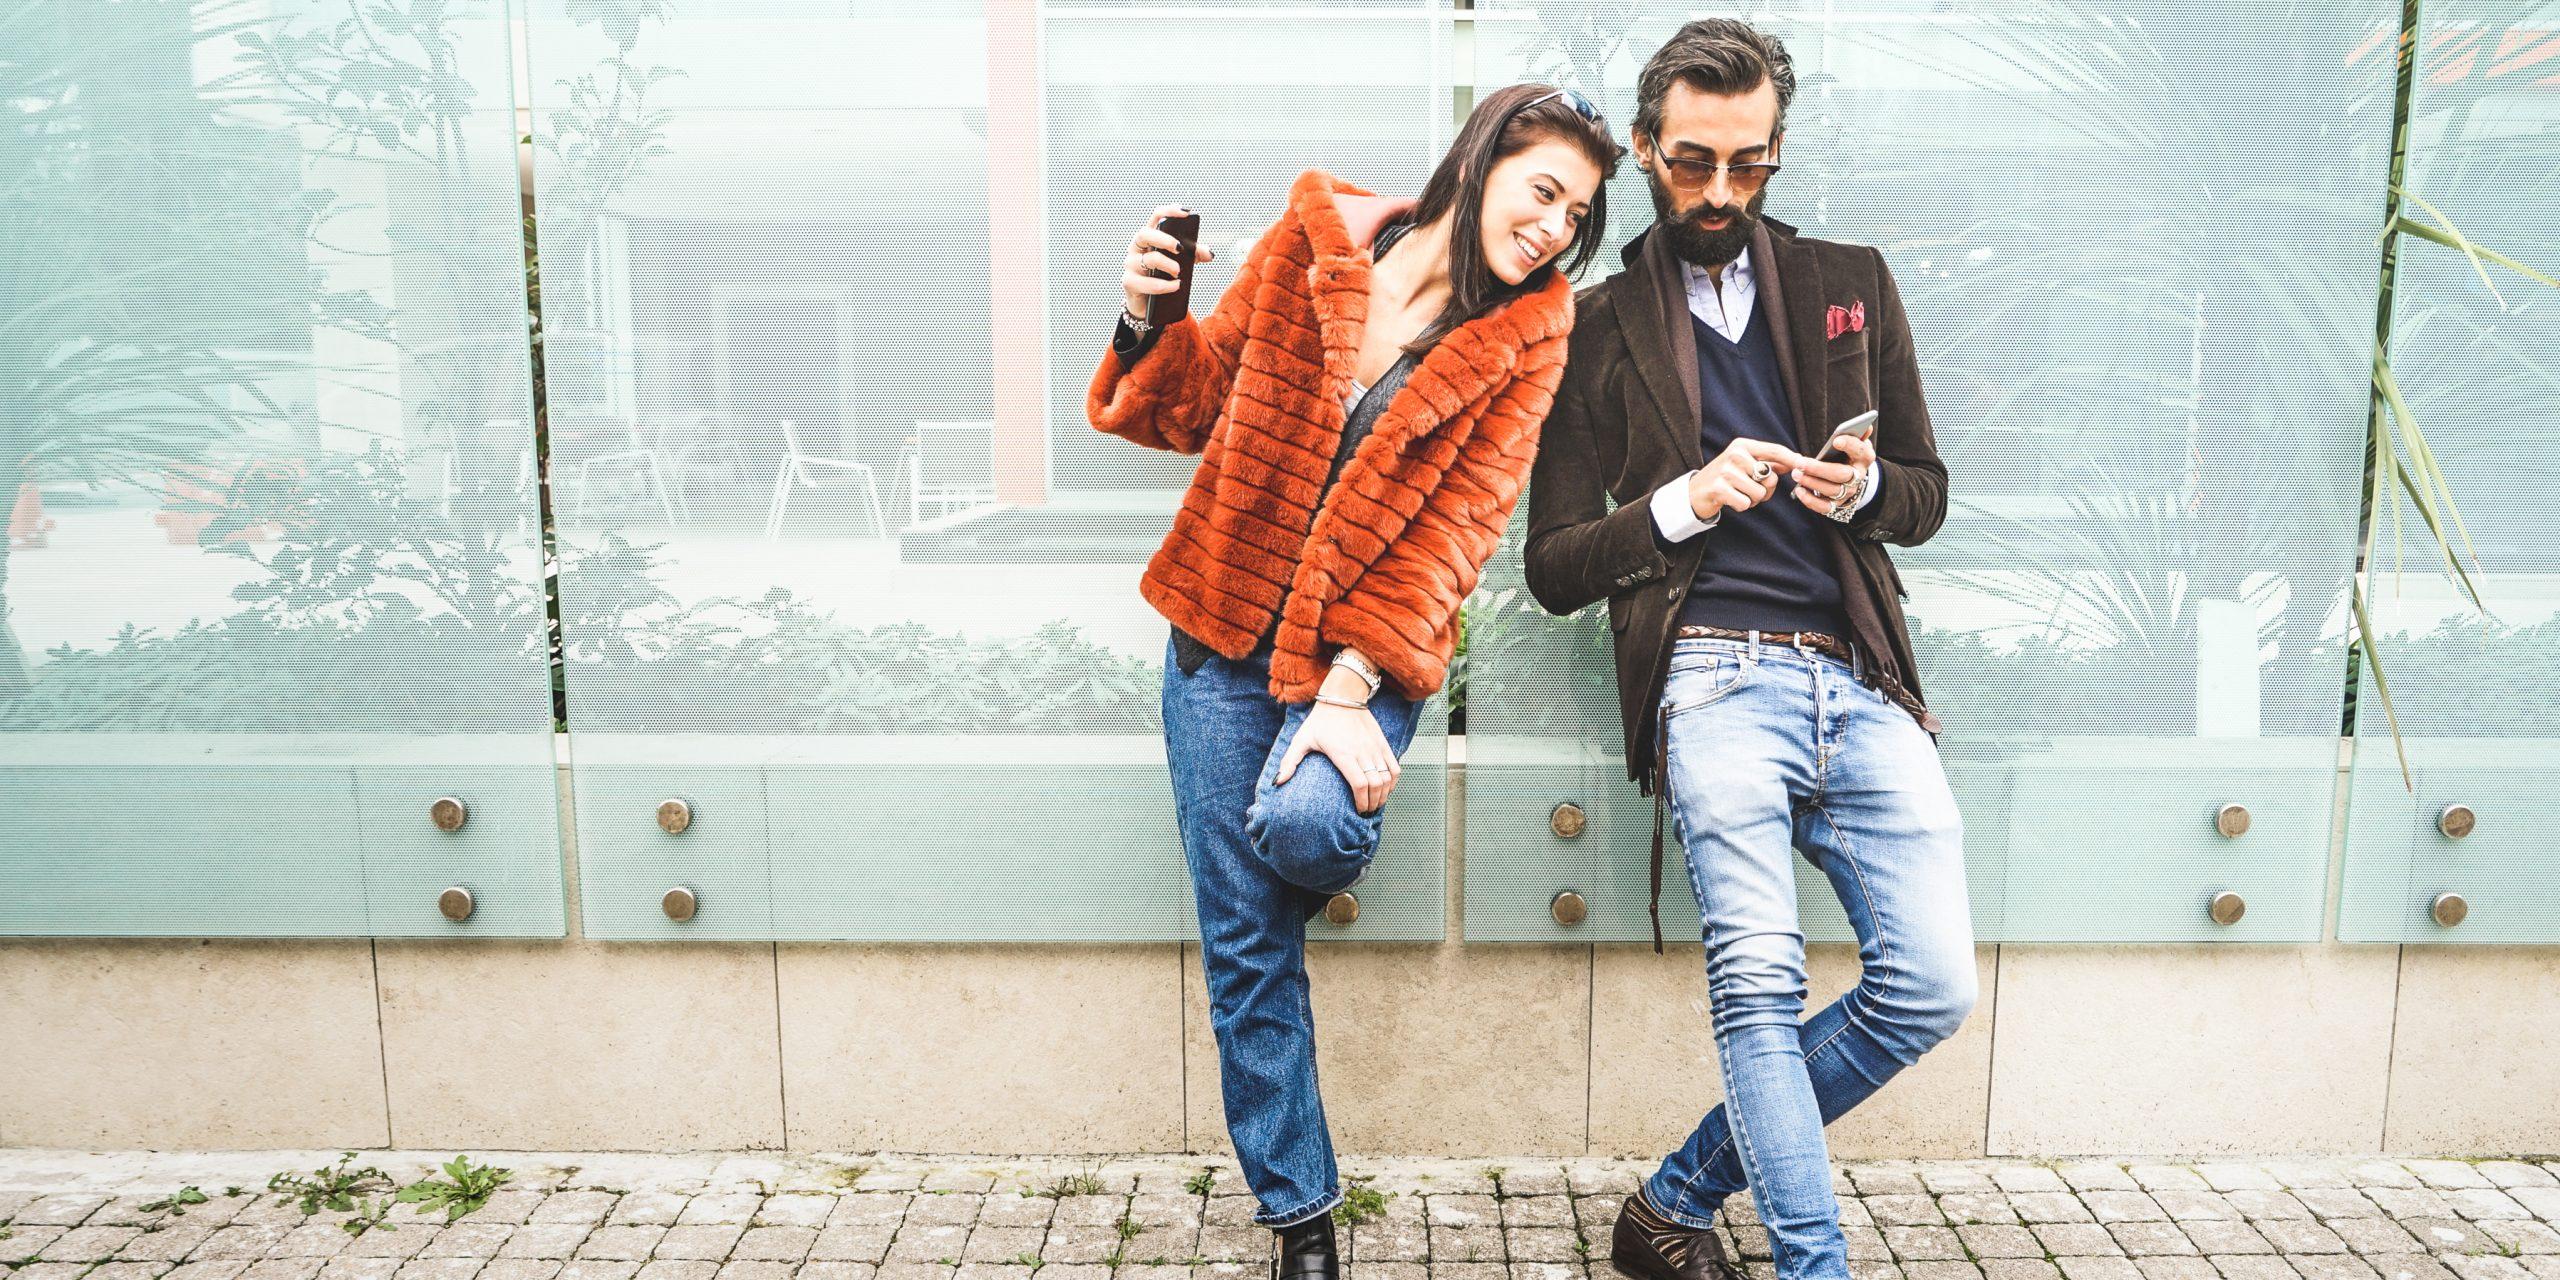 The Influencer Marketing Push